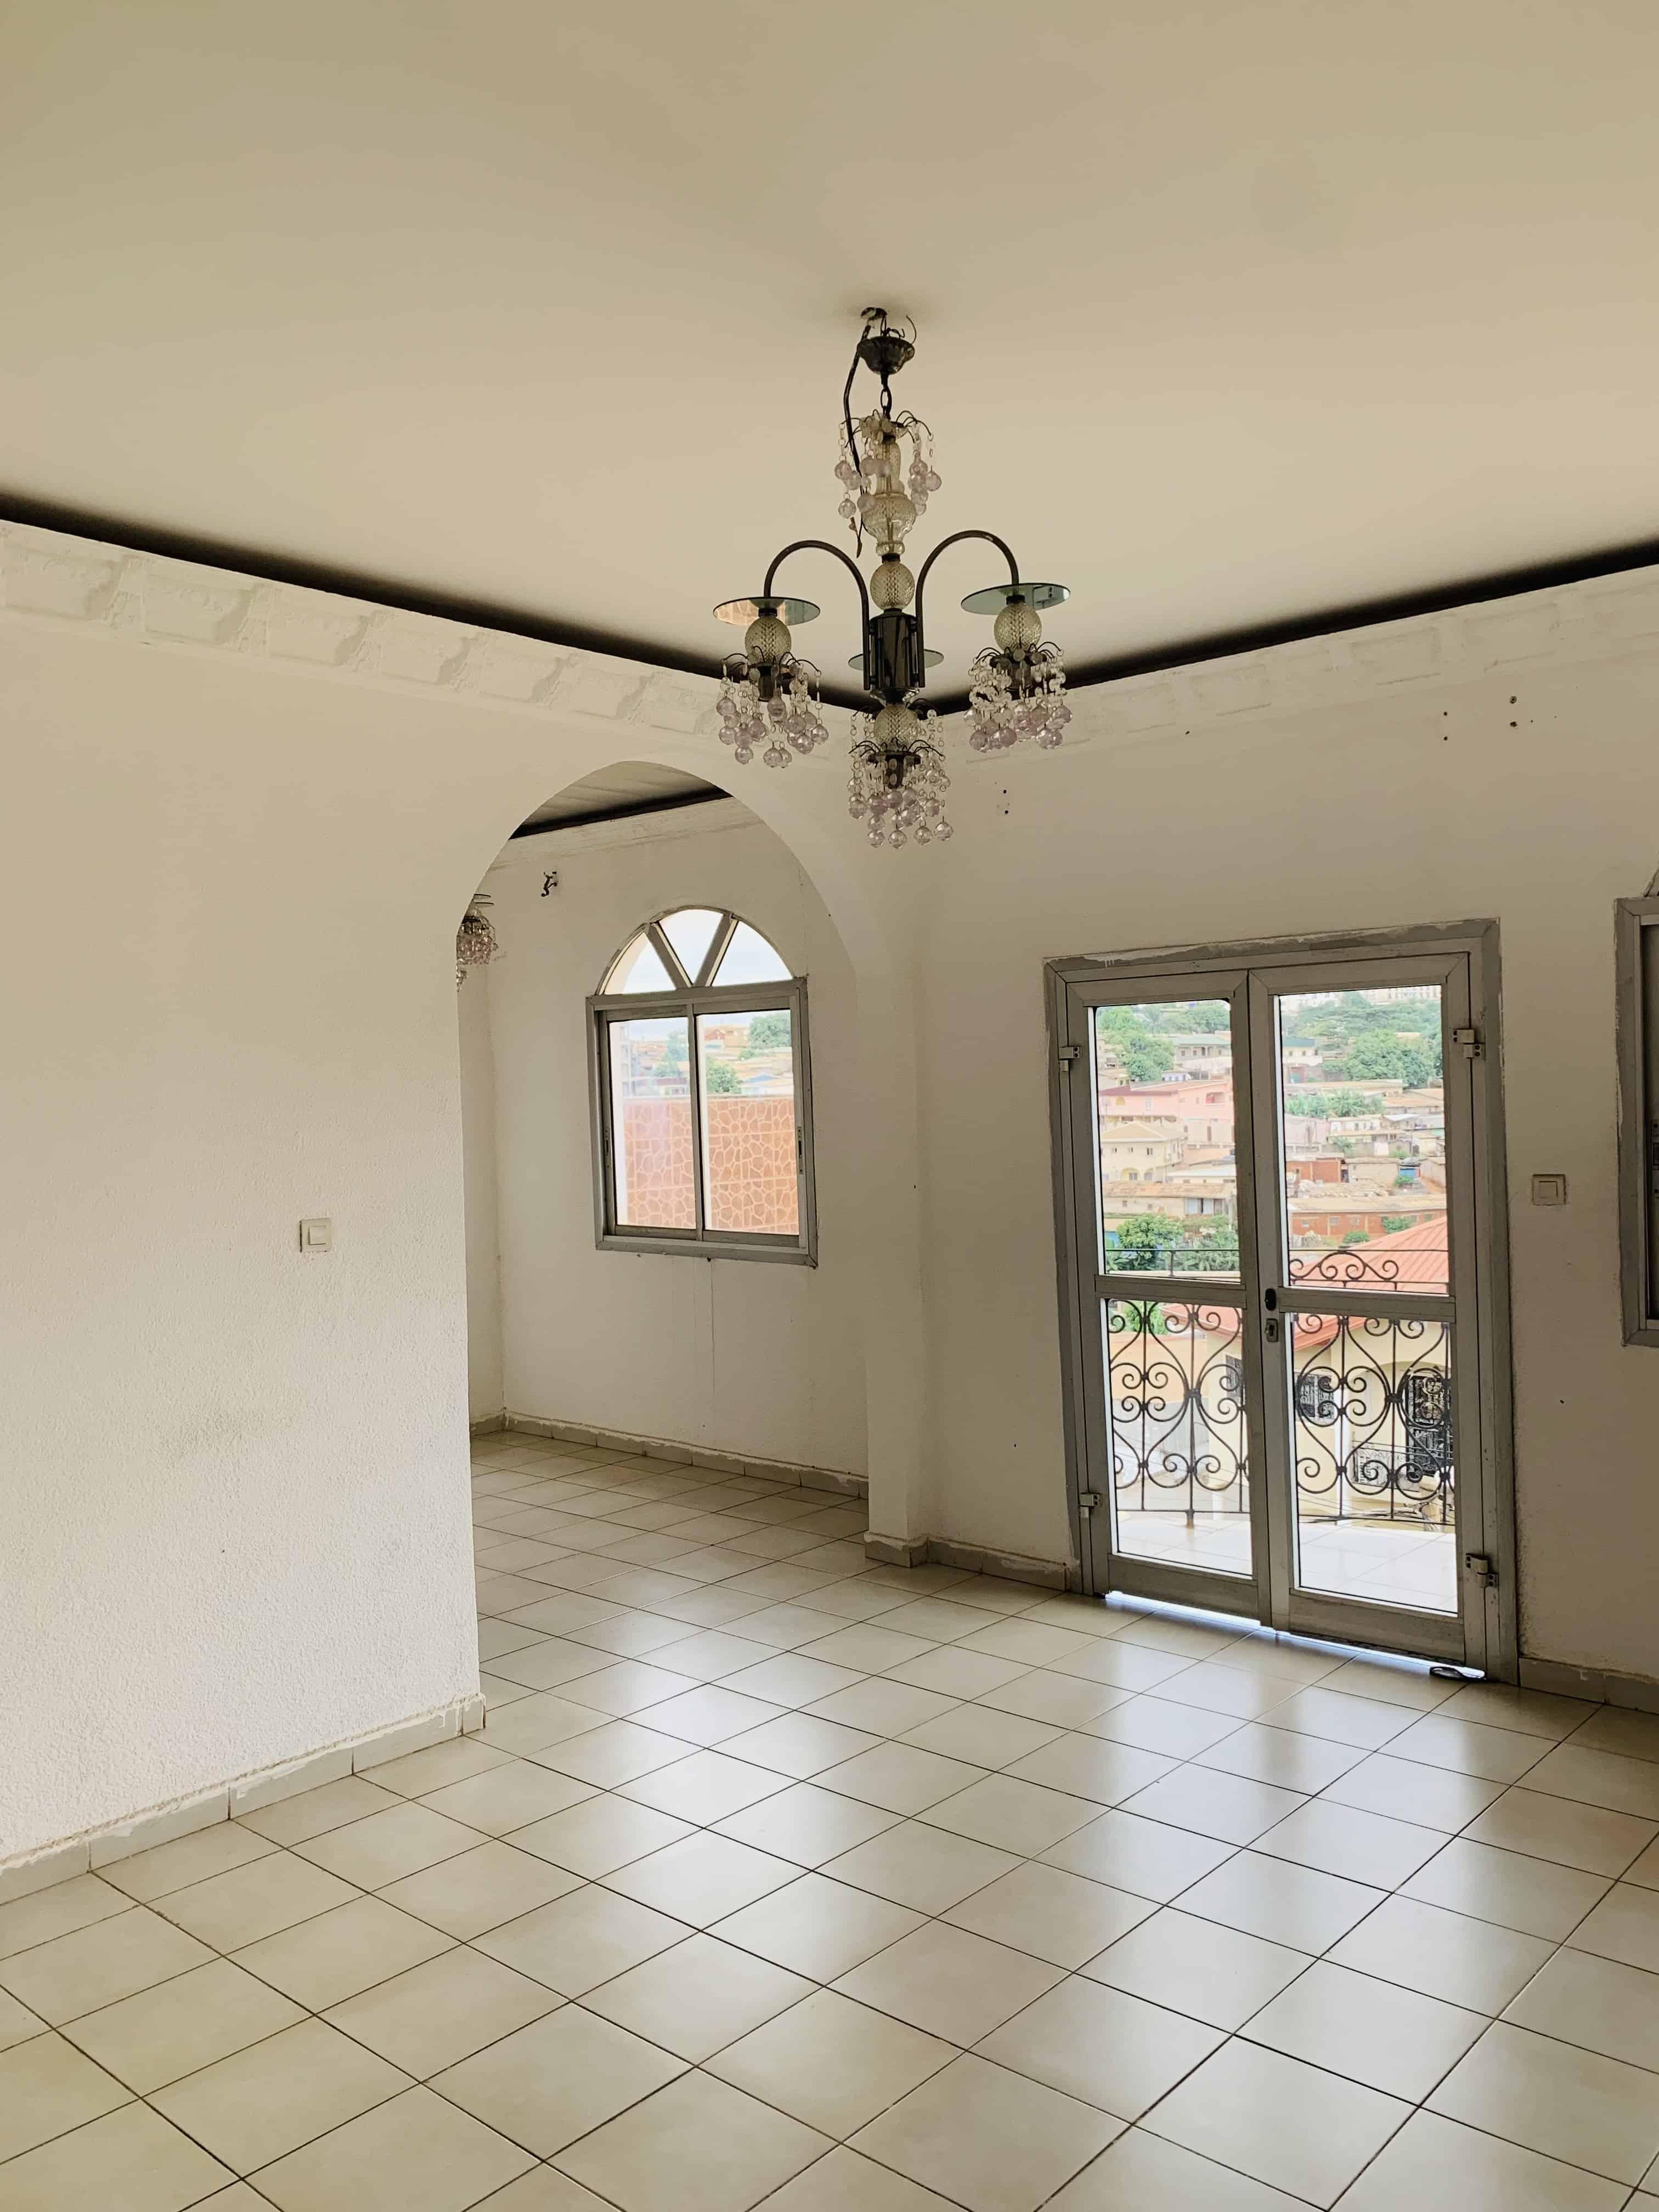 Apartment to rent - Yaoundé, Mfandena, Derrière stade omnisports - 1 living room(s), 2 bedroom(s), 1 bathroom(s) - 250 000 FCFA / month